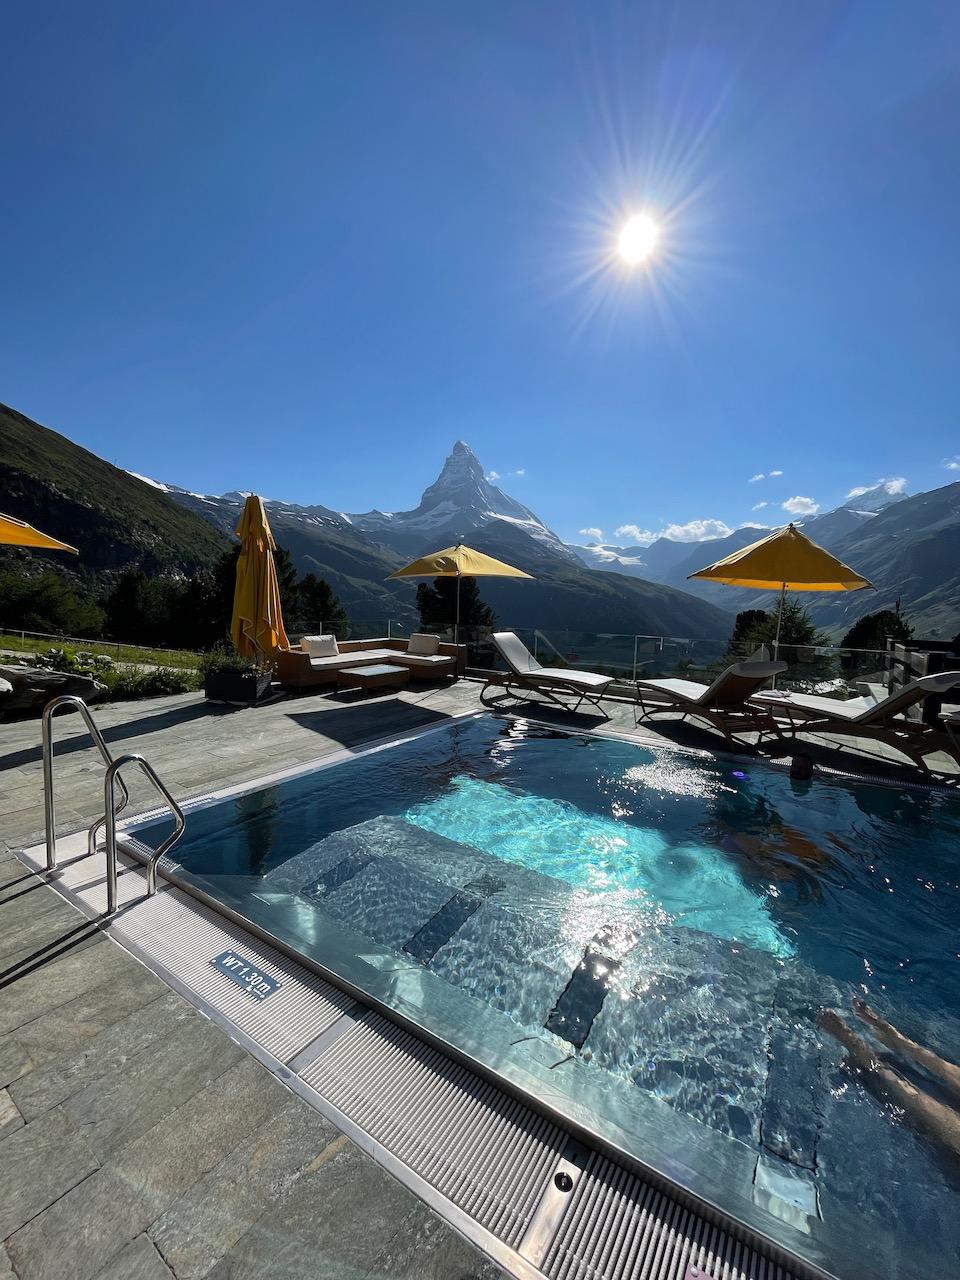 Riffelalp Resort Outdoor Jacuzzi Pool